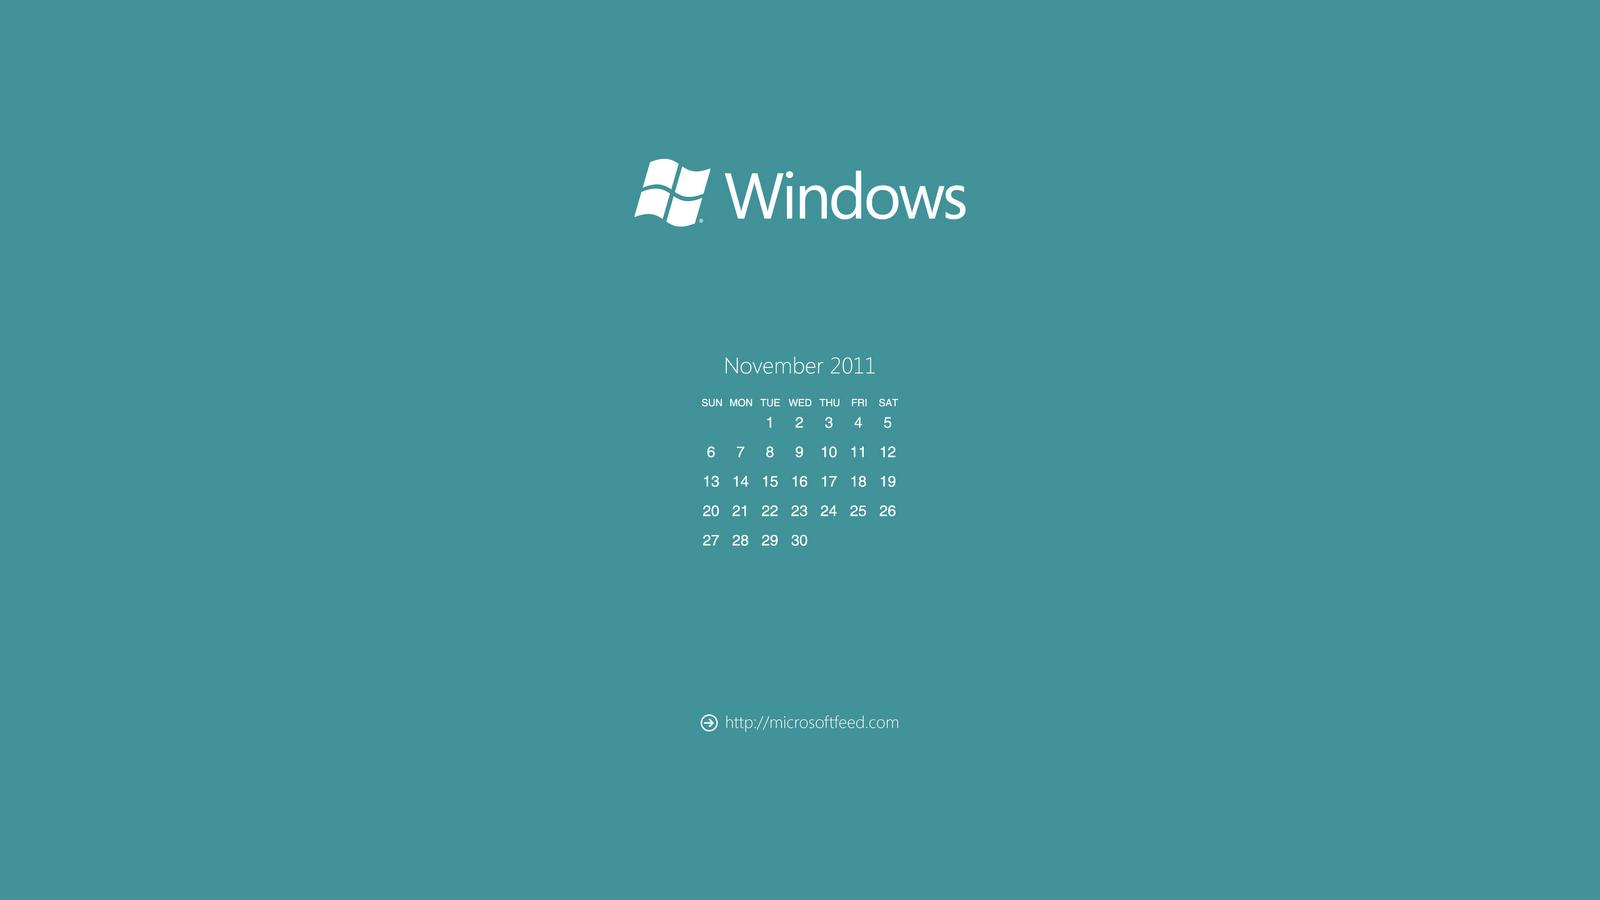 Calendar Wallpaper For Windows : Pin metro style desktop wallpaper calendar february